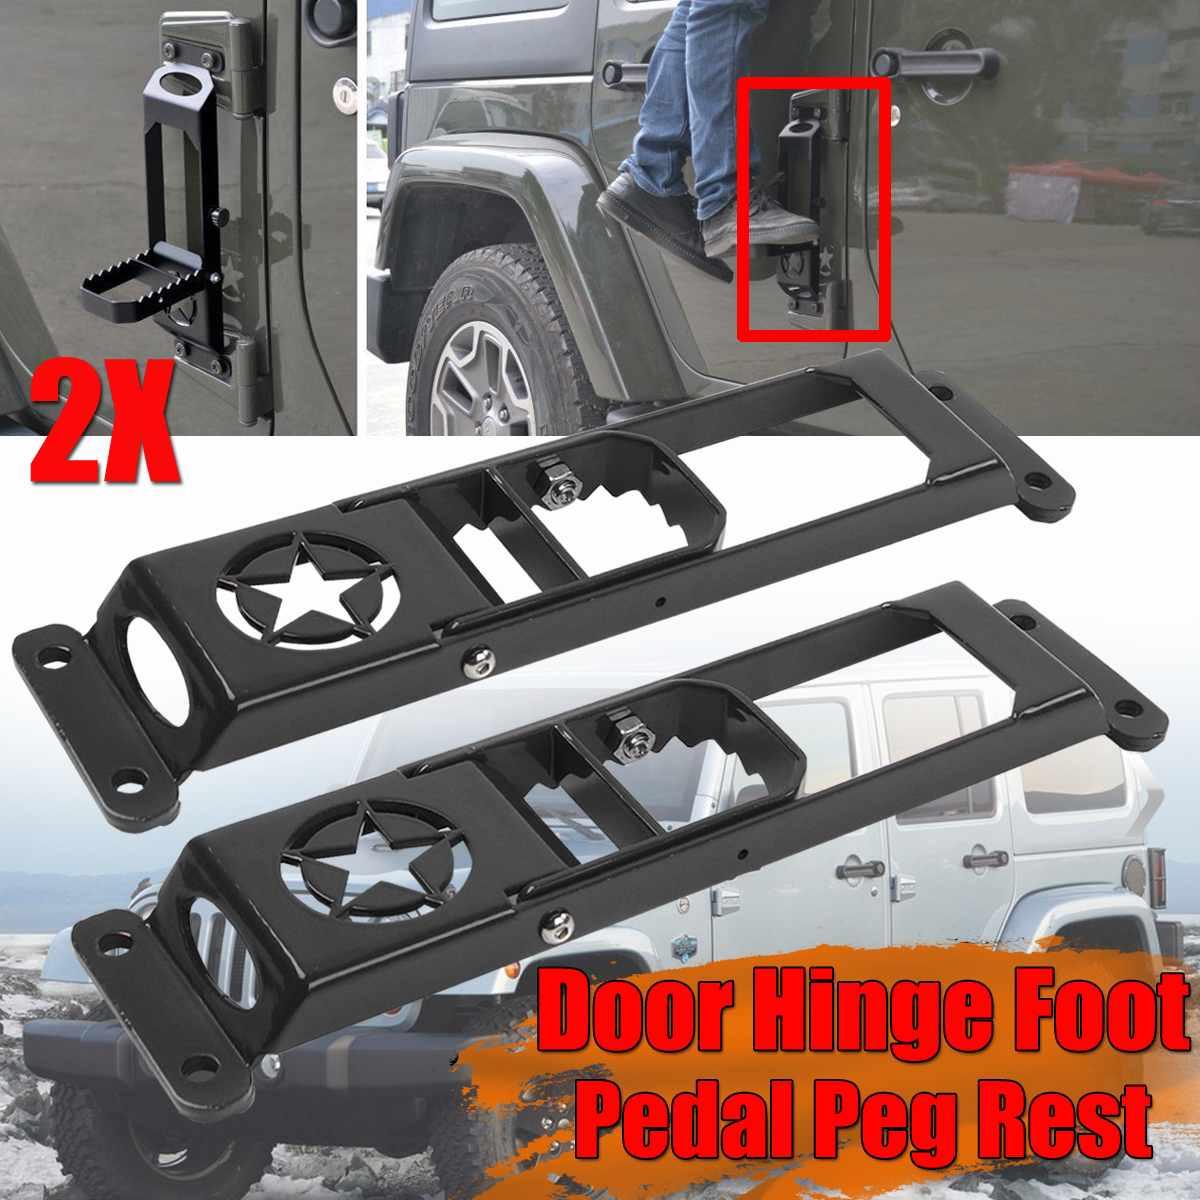 Back To Search Resultsautomobiles & Motorcycles Car Folding Door Hinge Foot Pedal Peg Rest For Jeep For Wrangler Jk 2007-2017 2/4dr Door Hinge Step Metal Folding Foot Peg Matel Exterior Door Panels & Frames